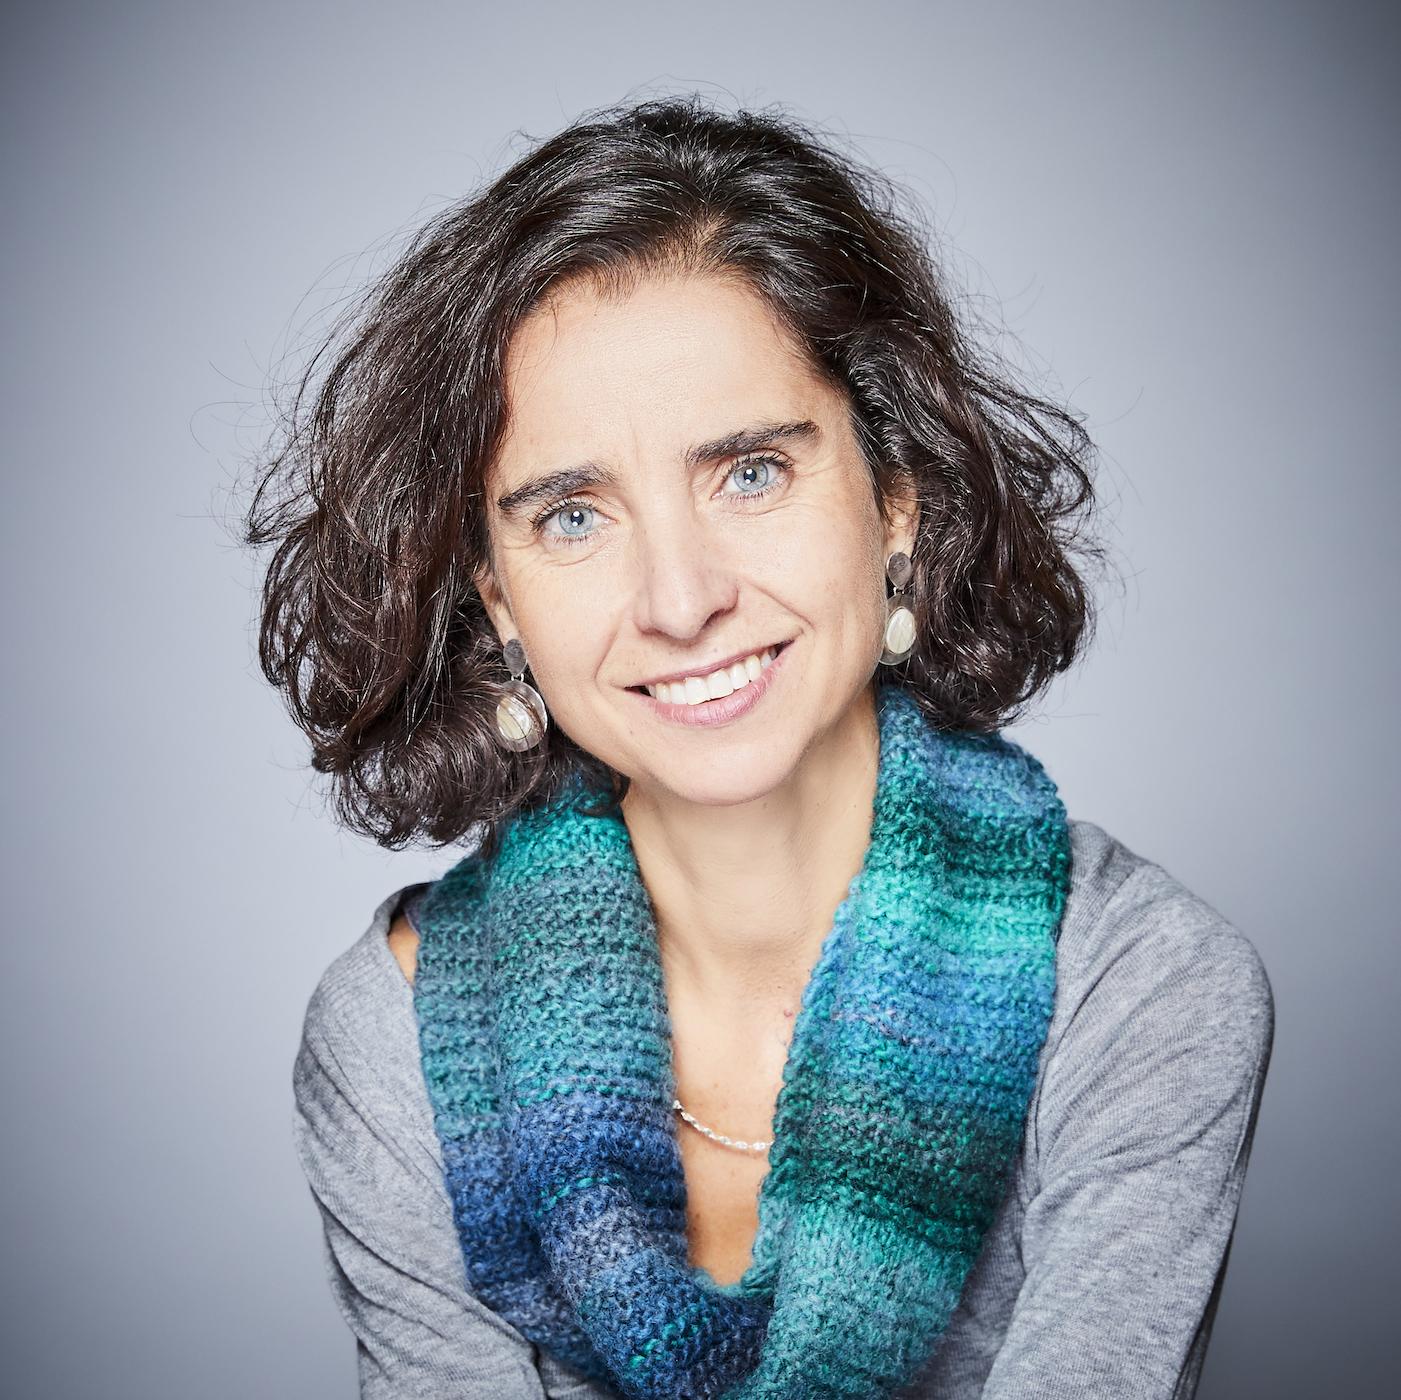 Isabel Puente